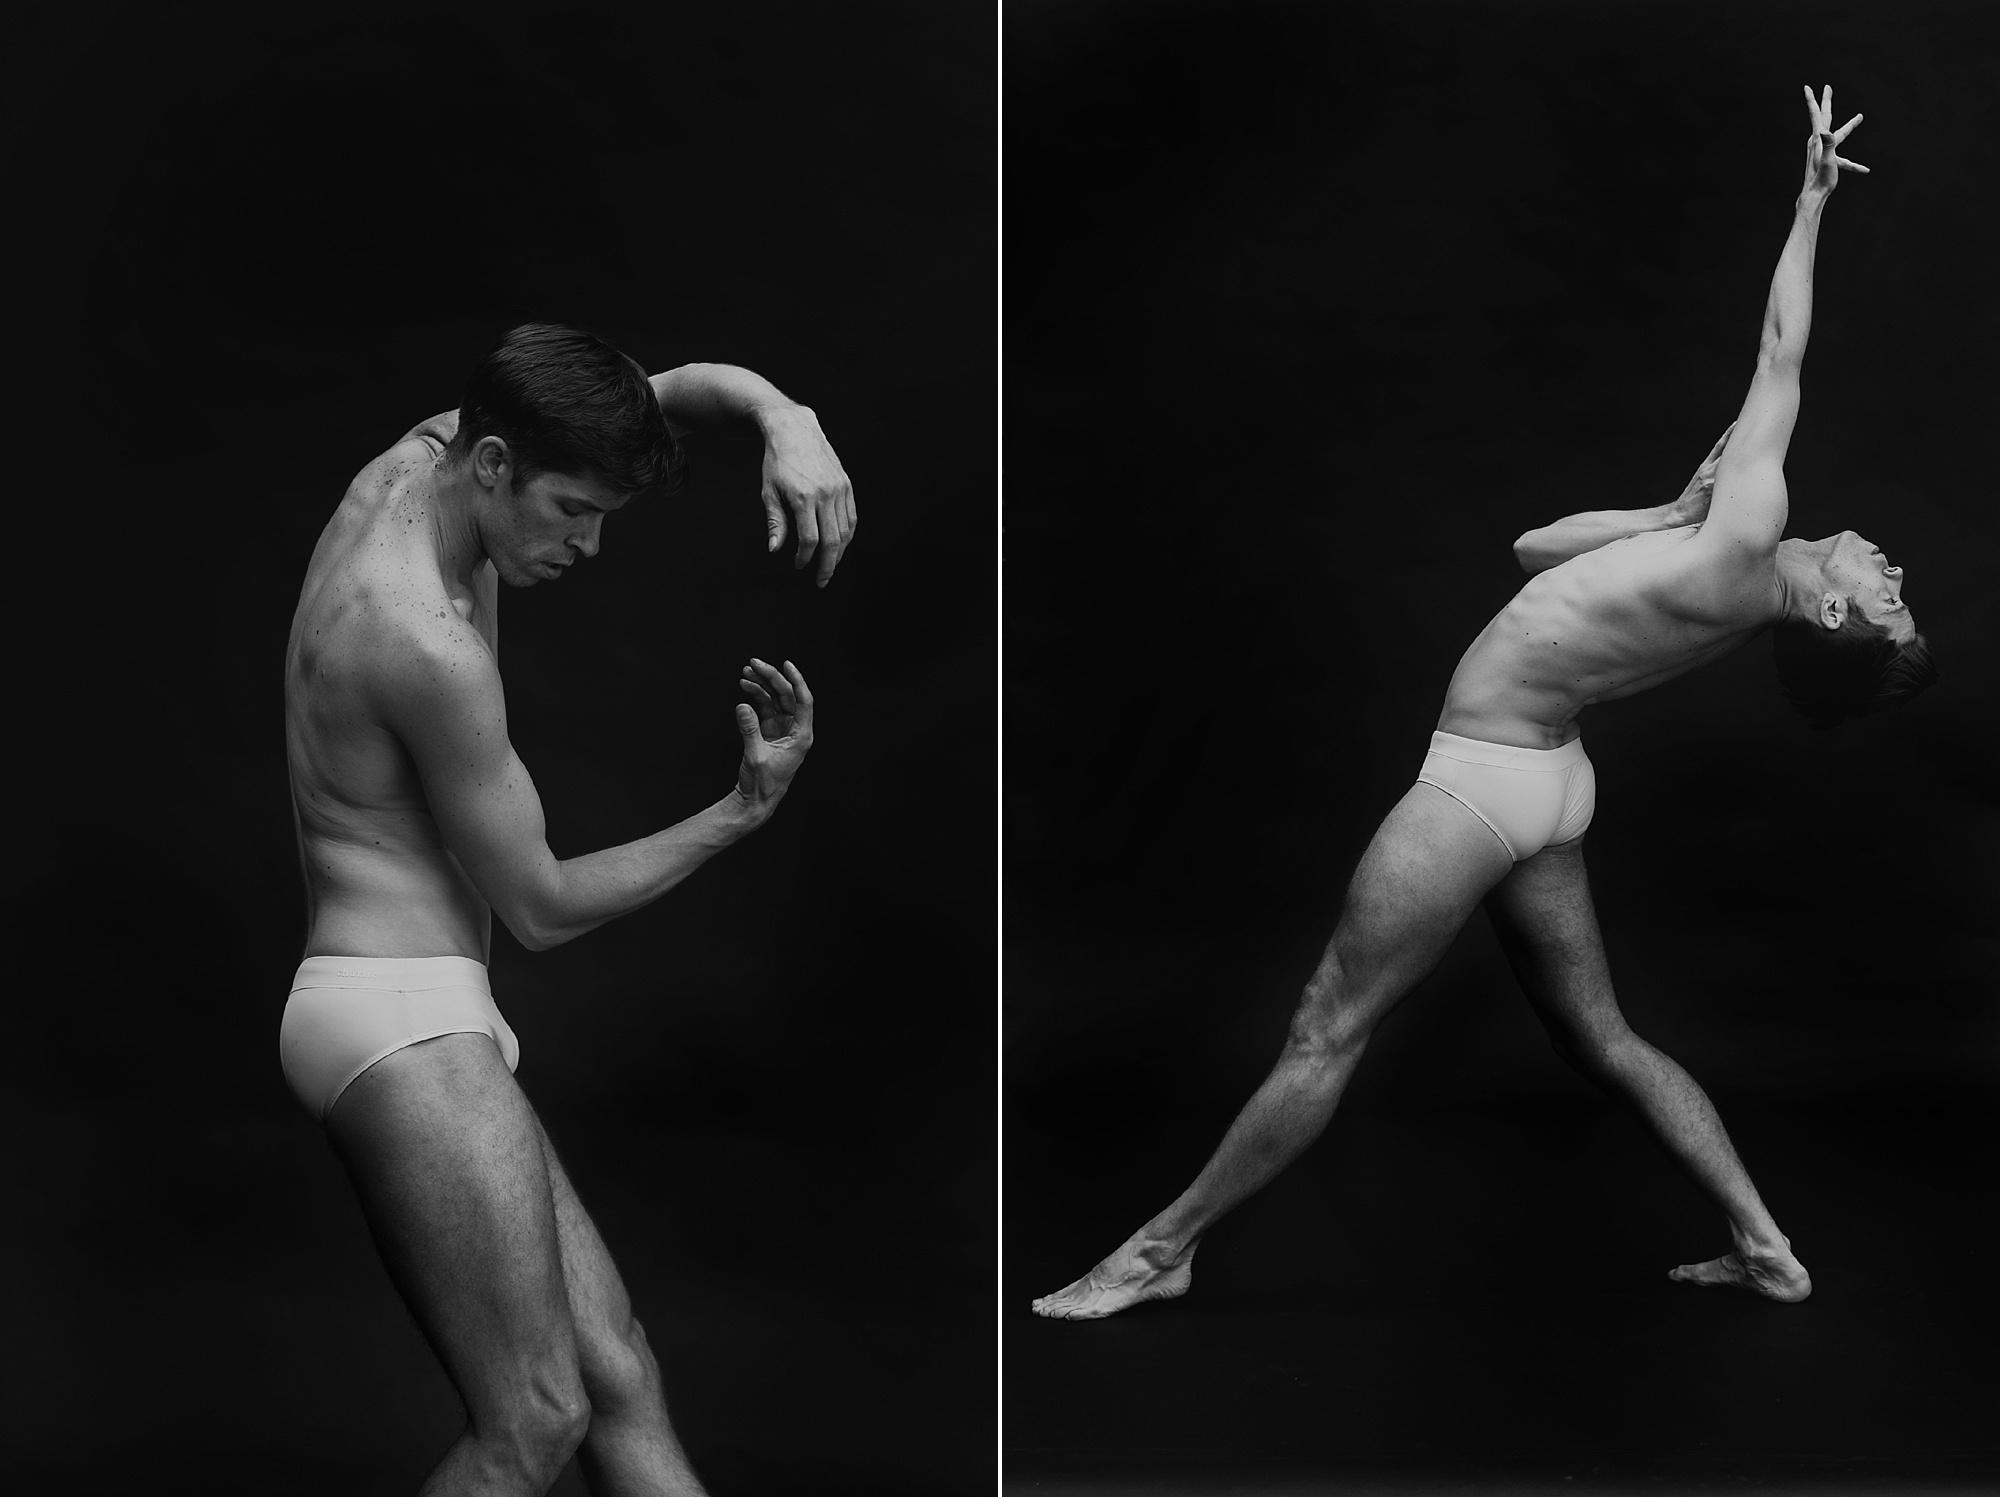 Joe_Mac_Creative_Nude_Portrait_Male_Philadelphia_Chad_Sapp__0043.jpg